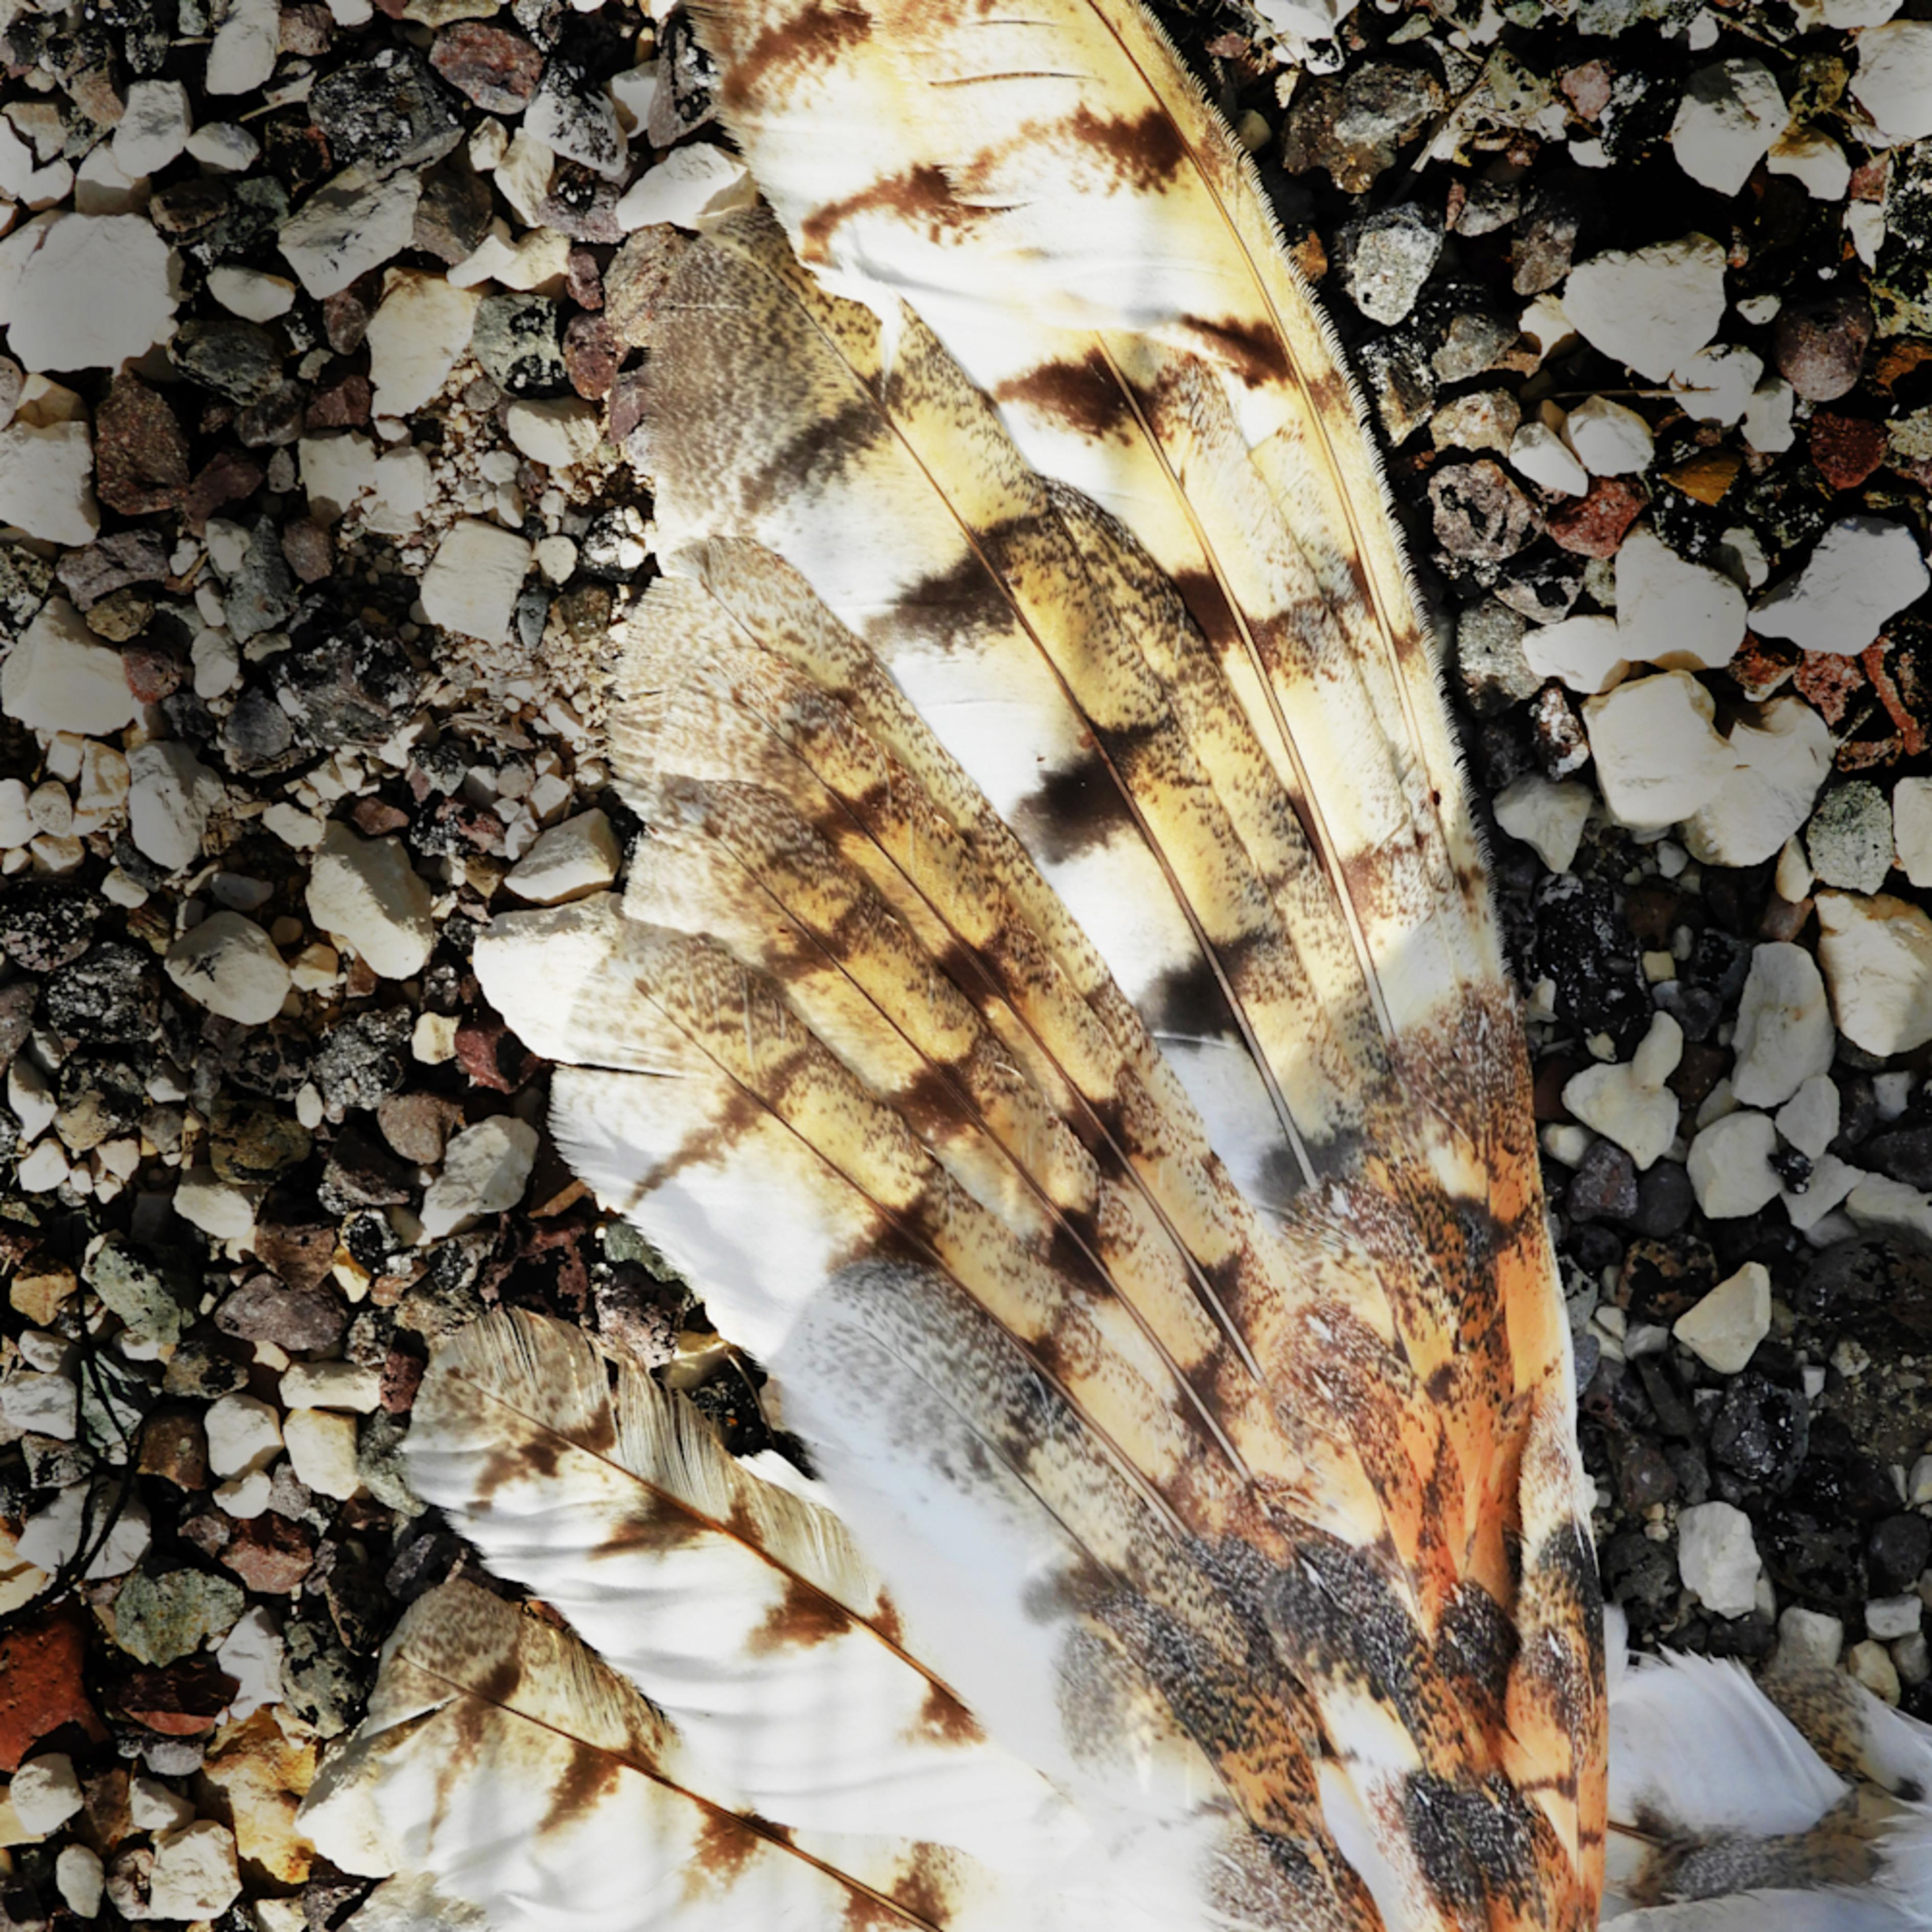 Dscn3094 owl wing hn4ehg